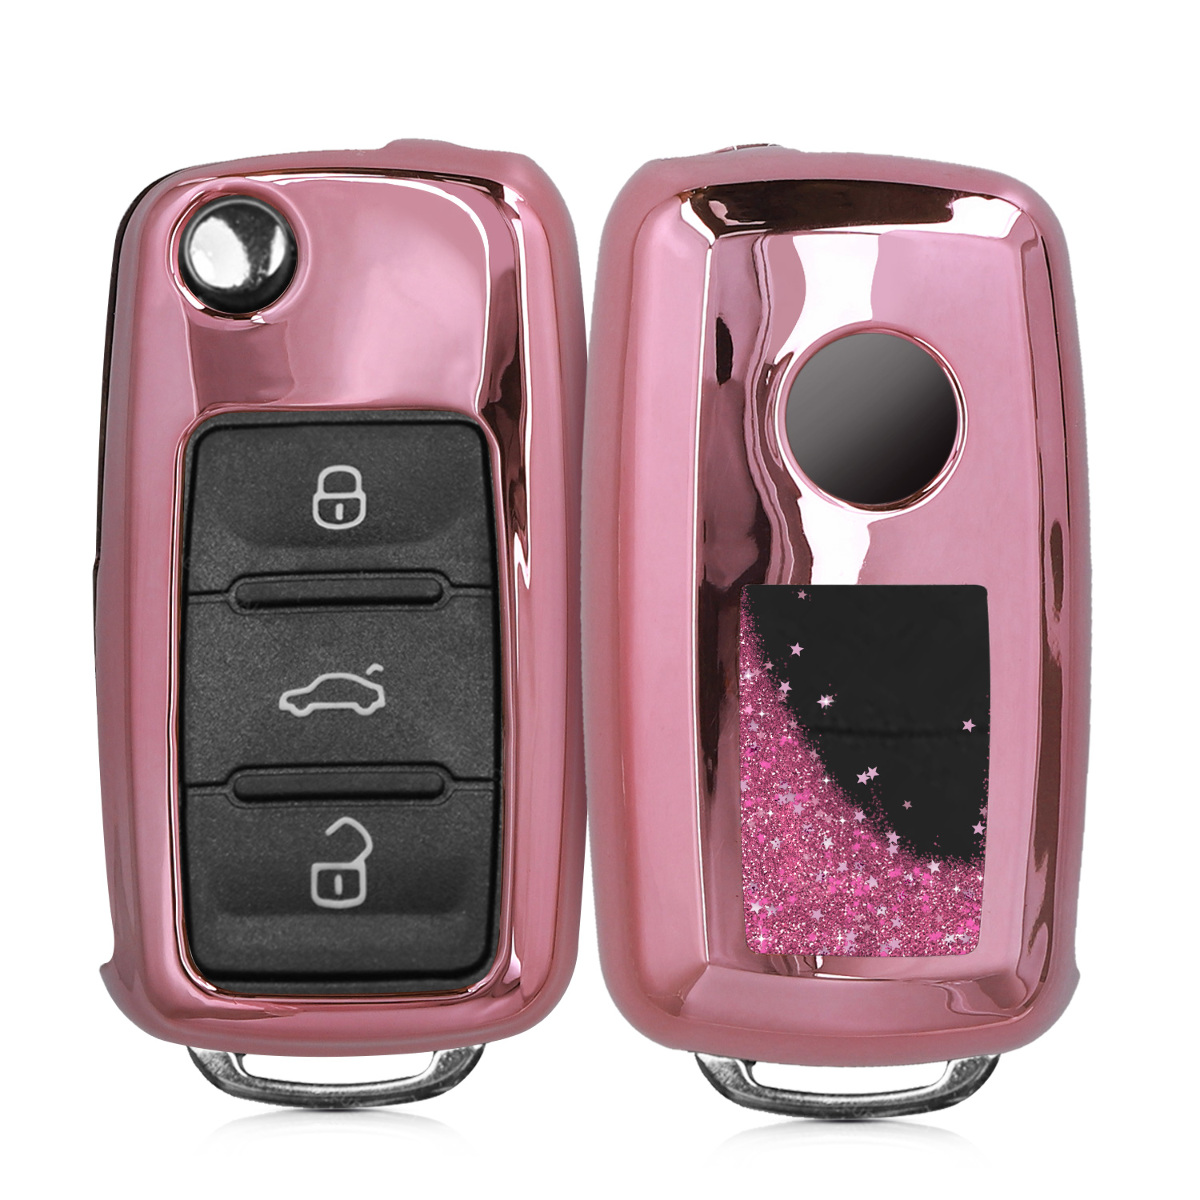 KW Θήκη Κλειδιού VW / Skoda / Seat - Σιλικόνη - 3 Κουμπιά - Stars Snow Globe - Dark Pink / Metallic Pink (50722.03)